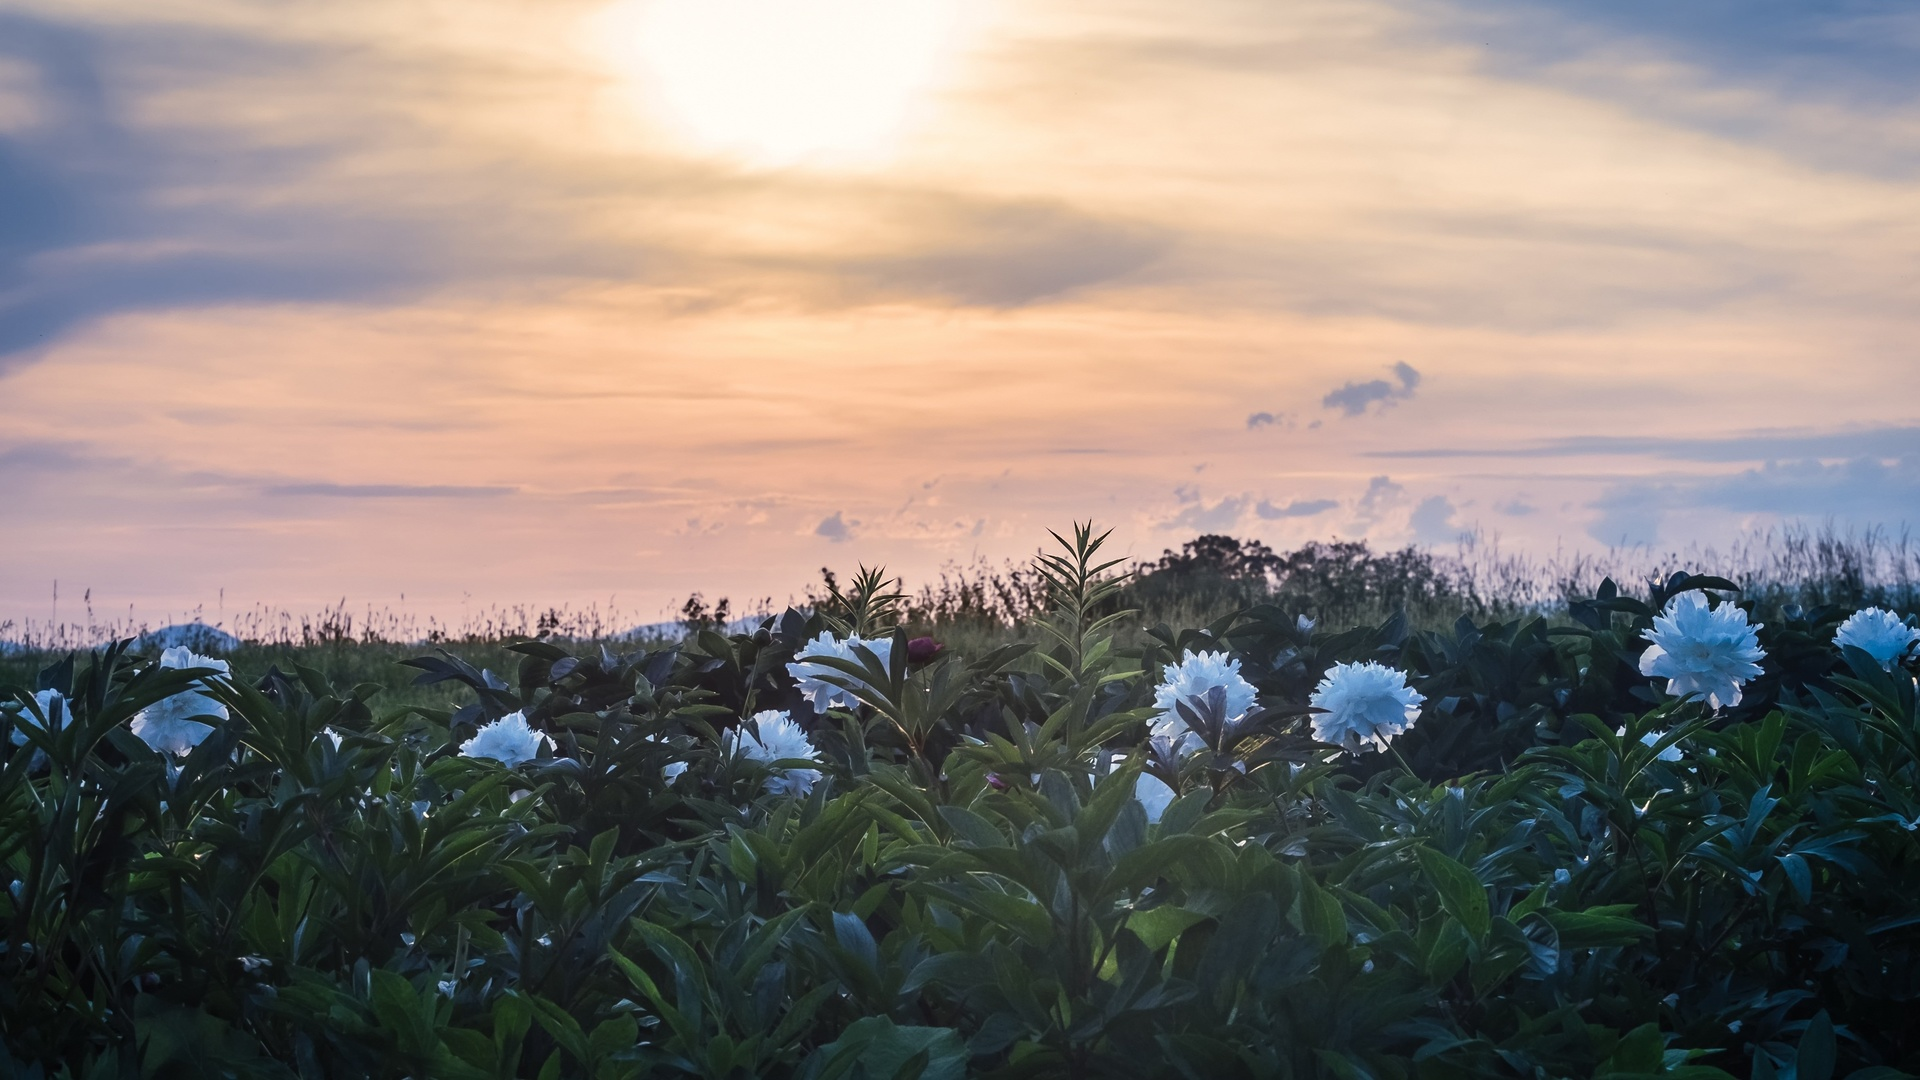 пион, цветение, сансет, сумерки, природа